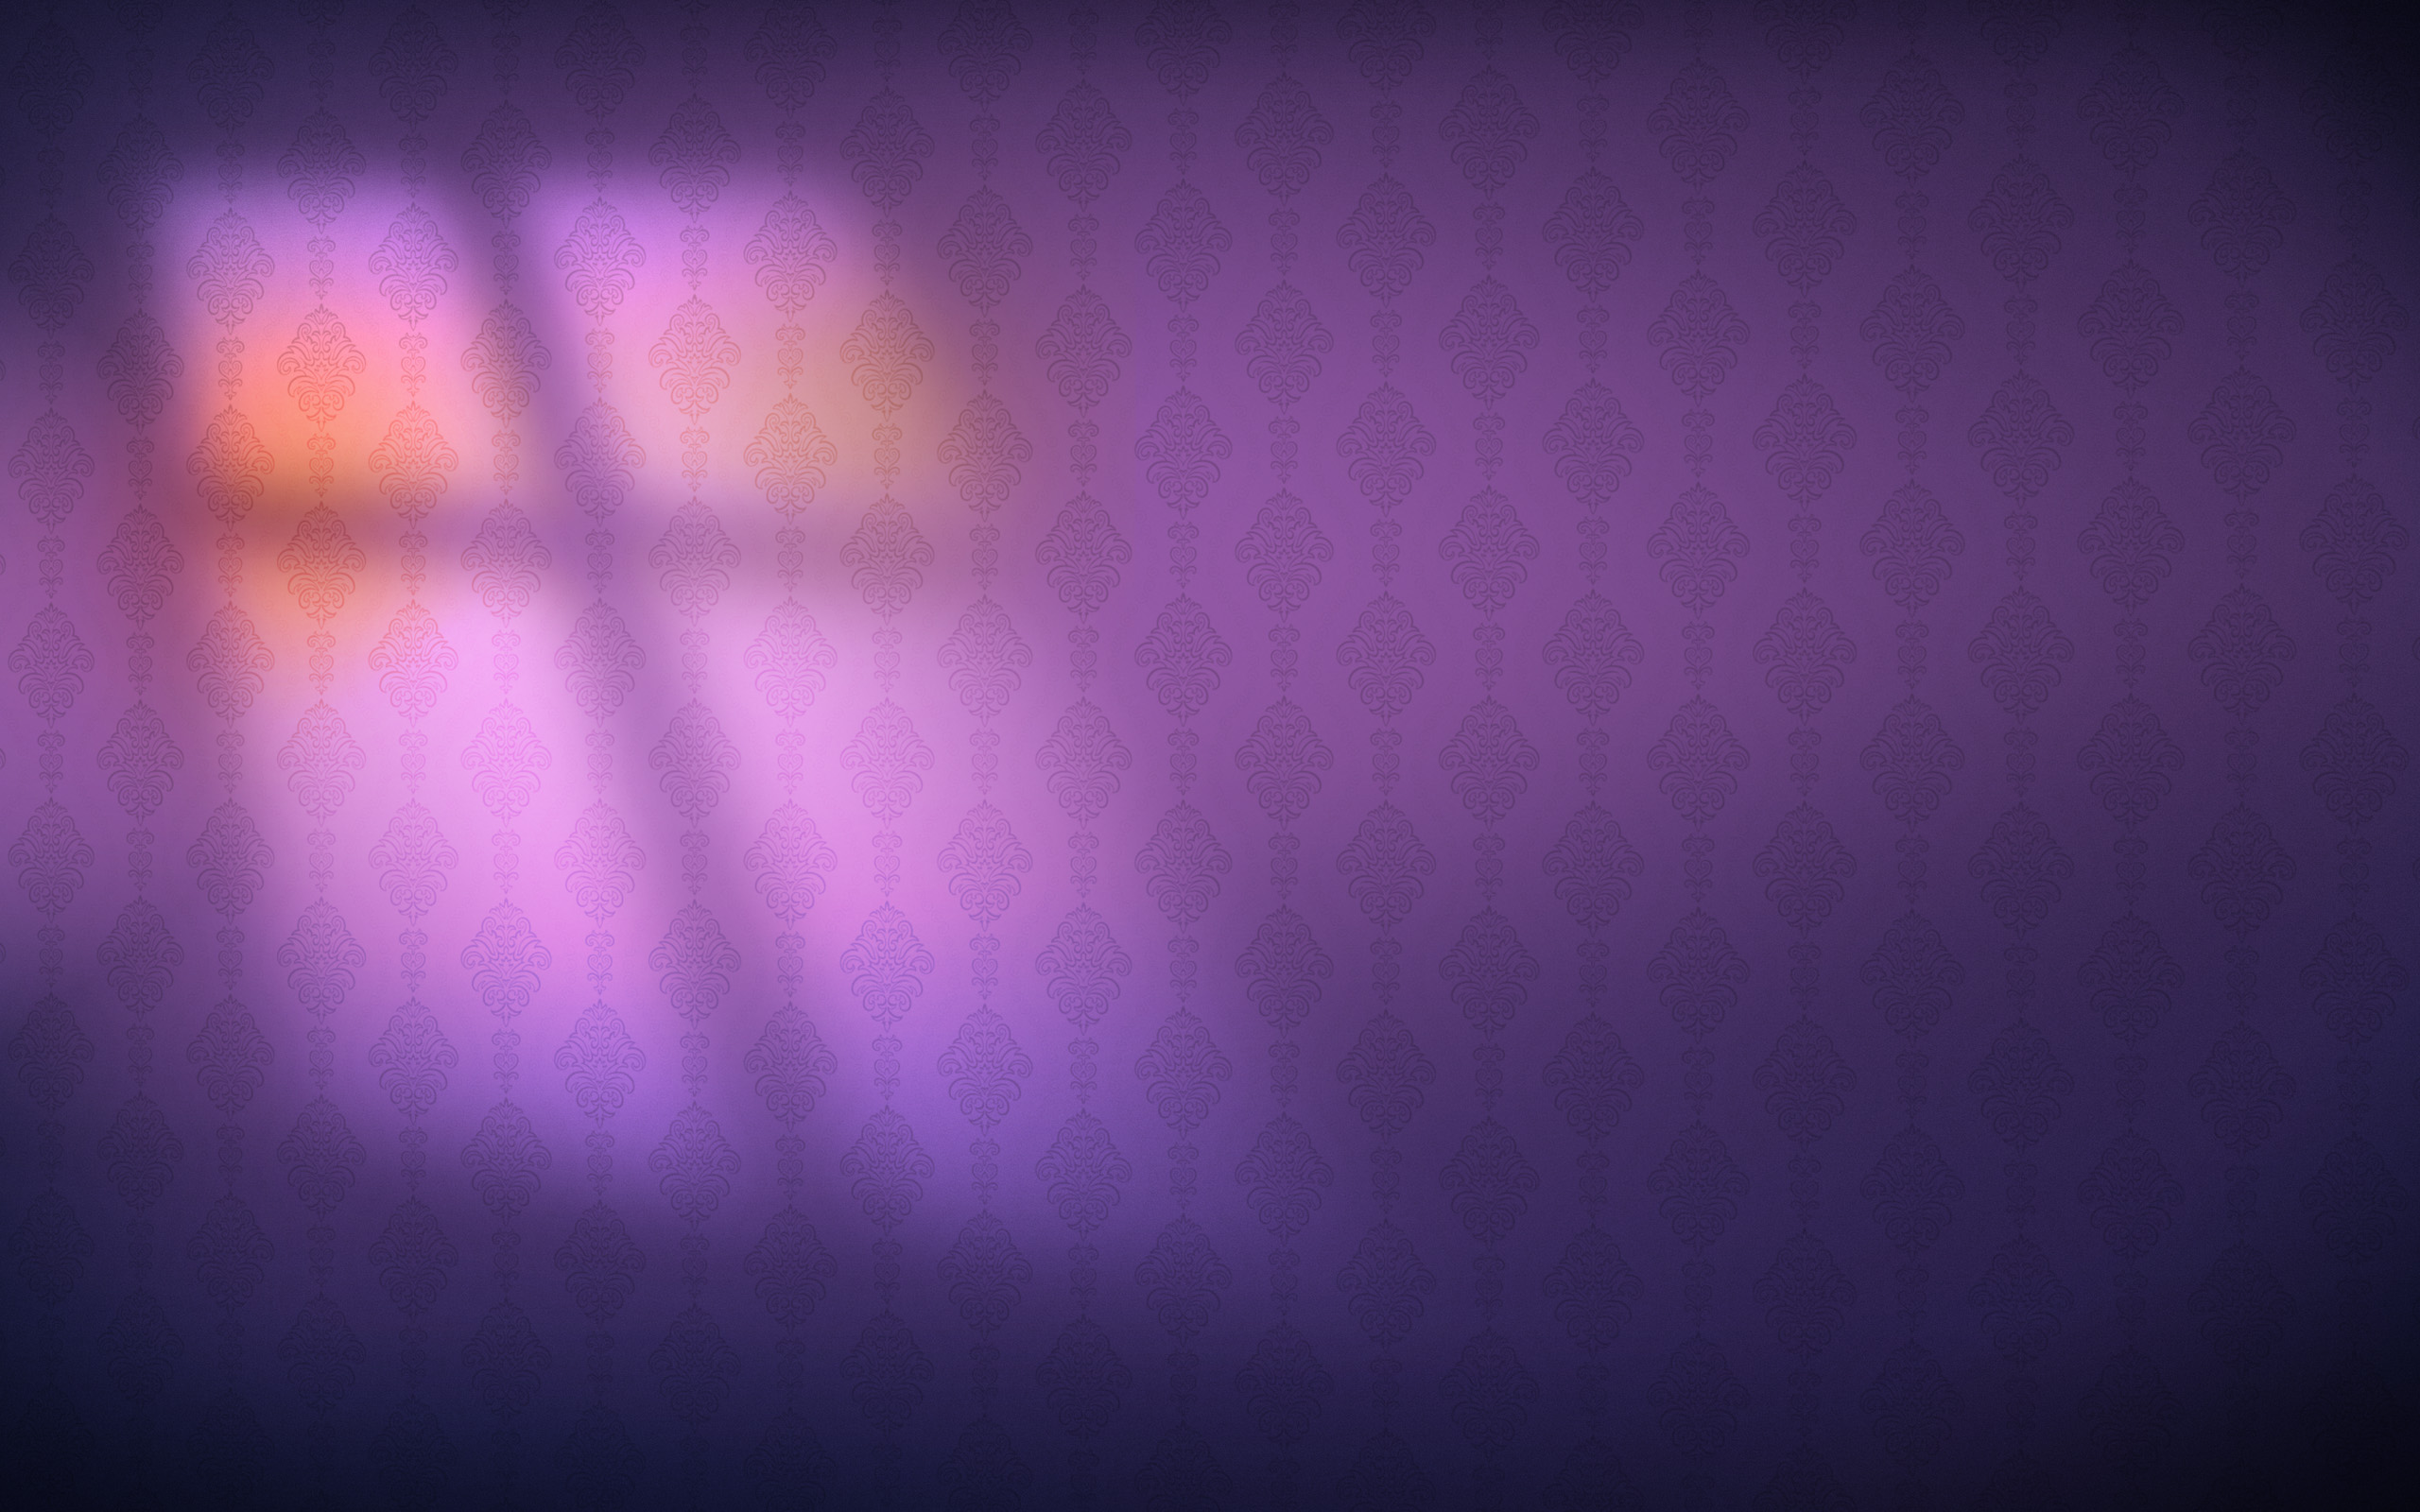 1680x1050 Purple Windows Abstract 1680x1050 Resolution HD 4k